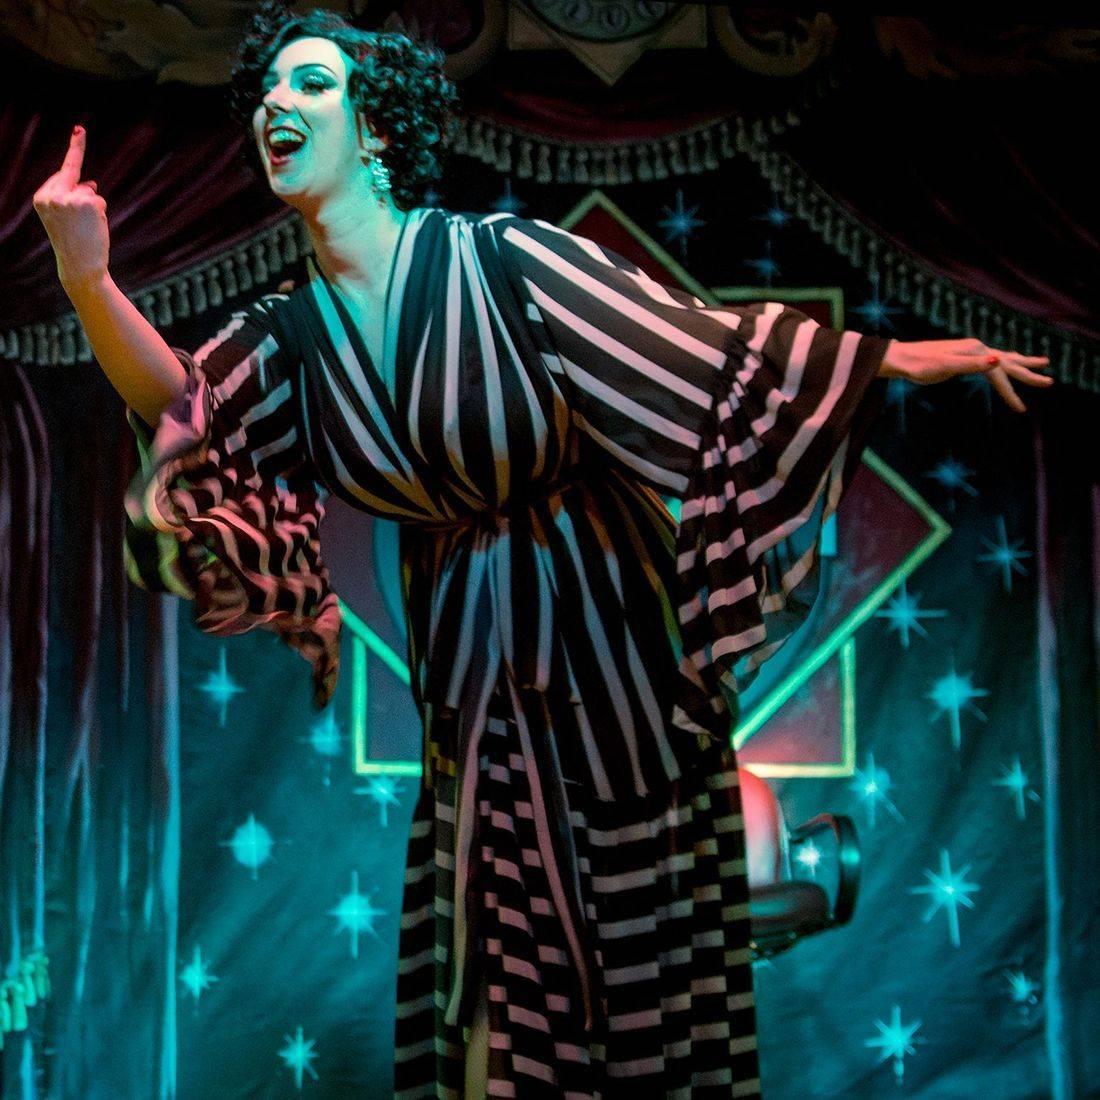 Valerie Savage, burlesque, cabaret, Torquay, Devon, Kinky & Quirky